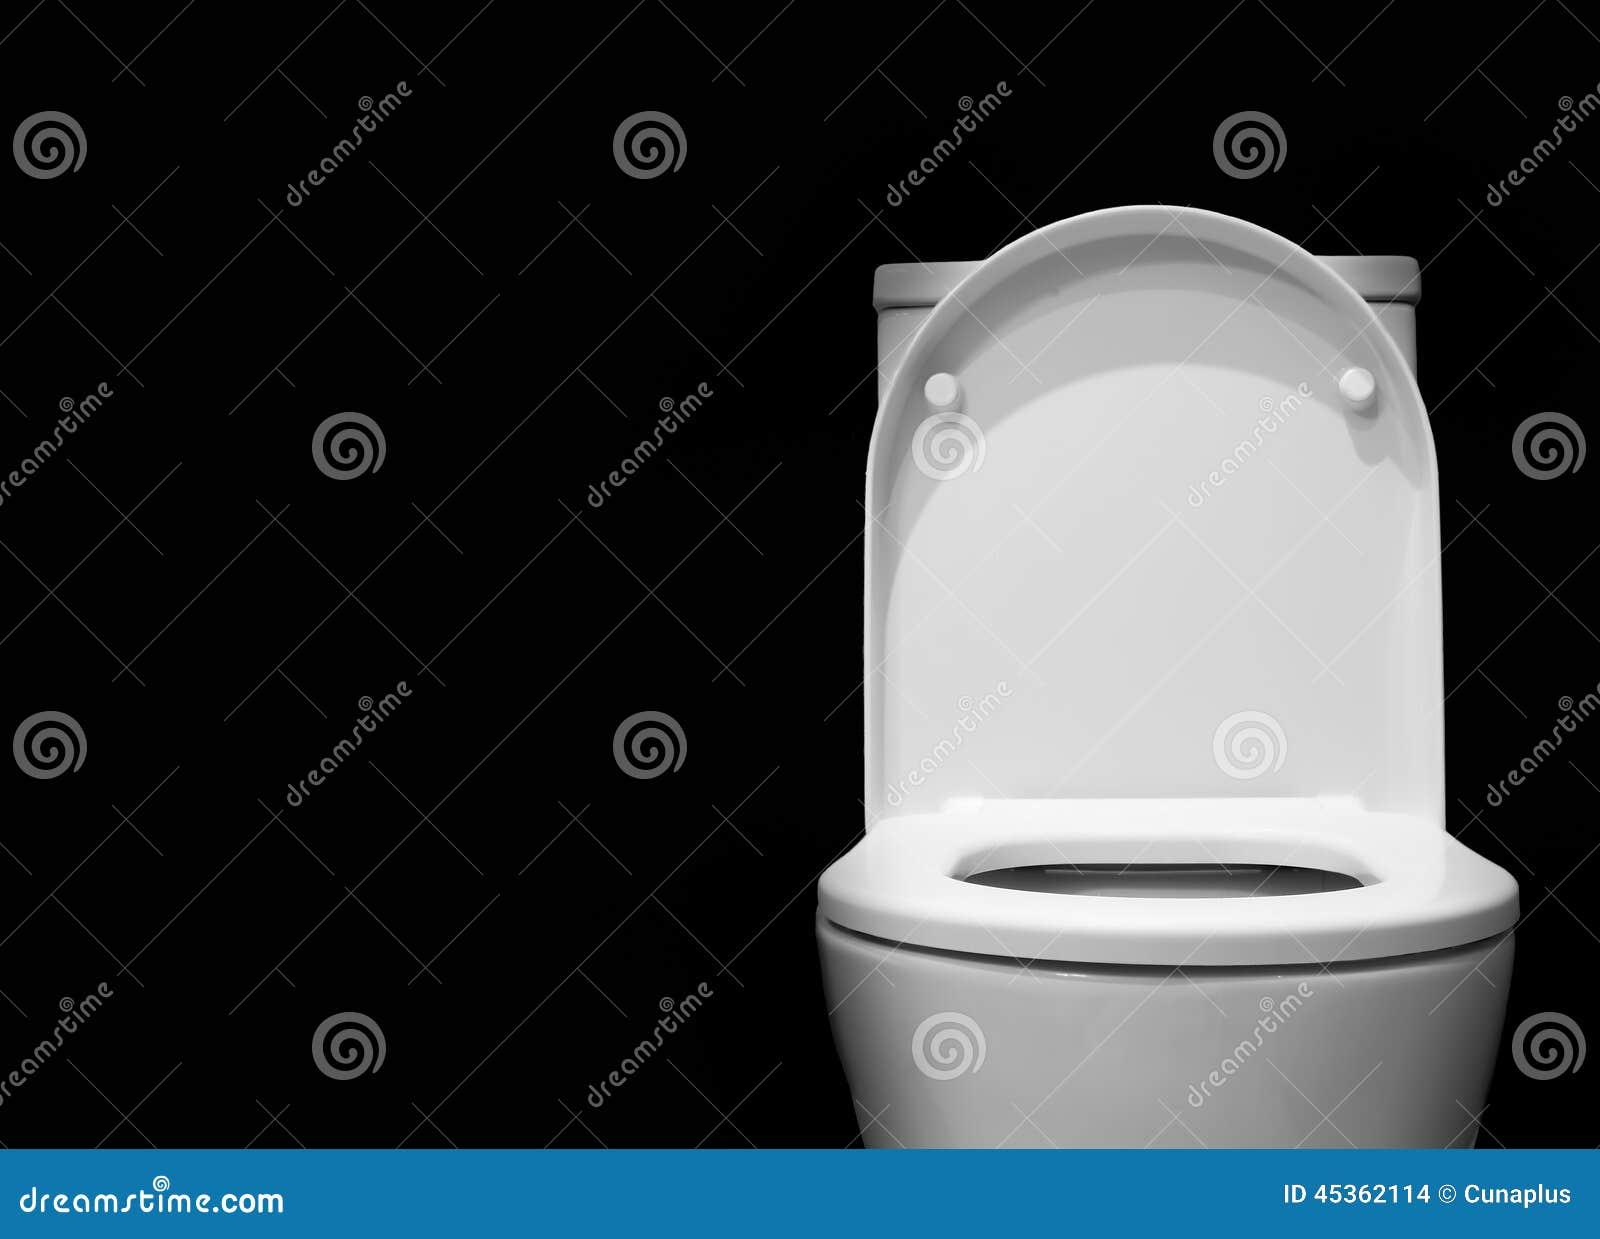 Toilet Bowl With Black Background Stock Photo Image - White toilet with black seat